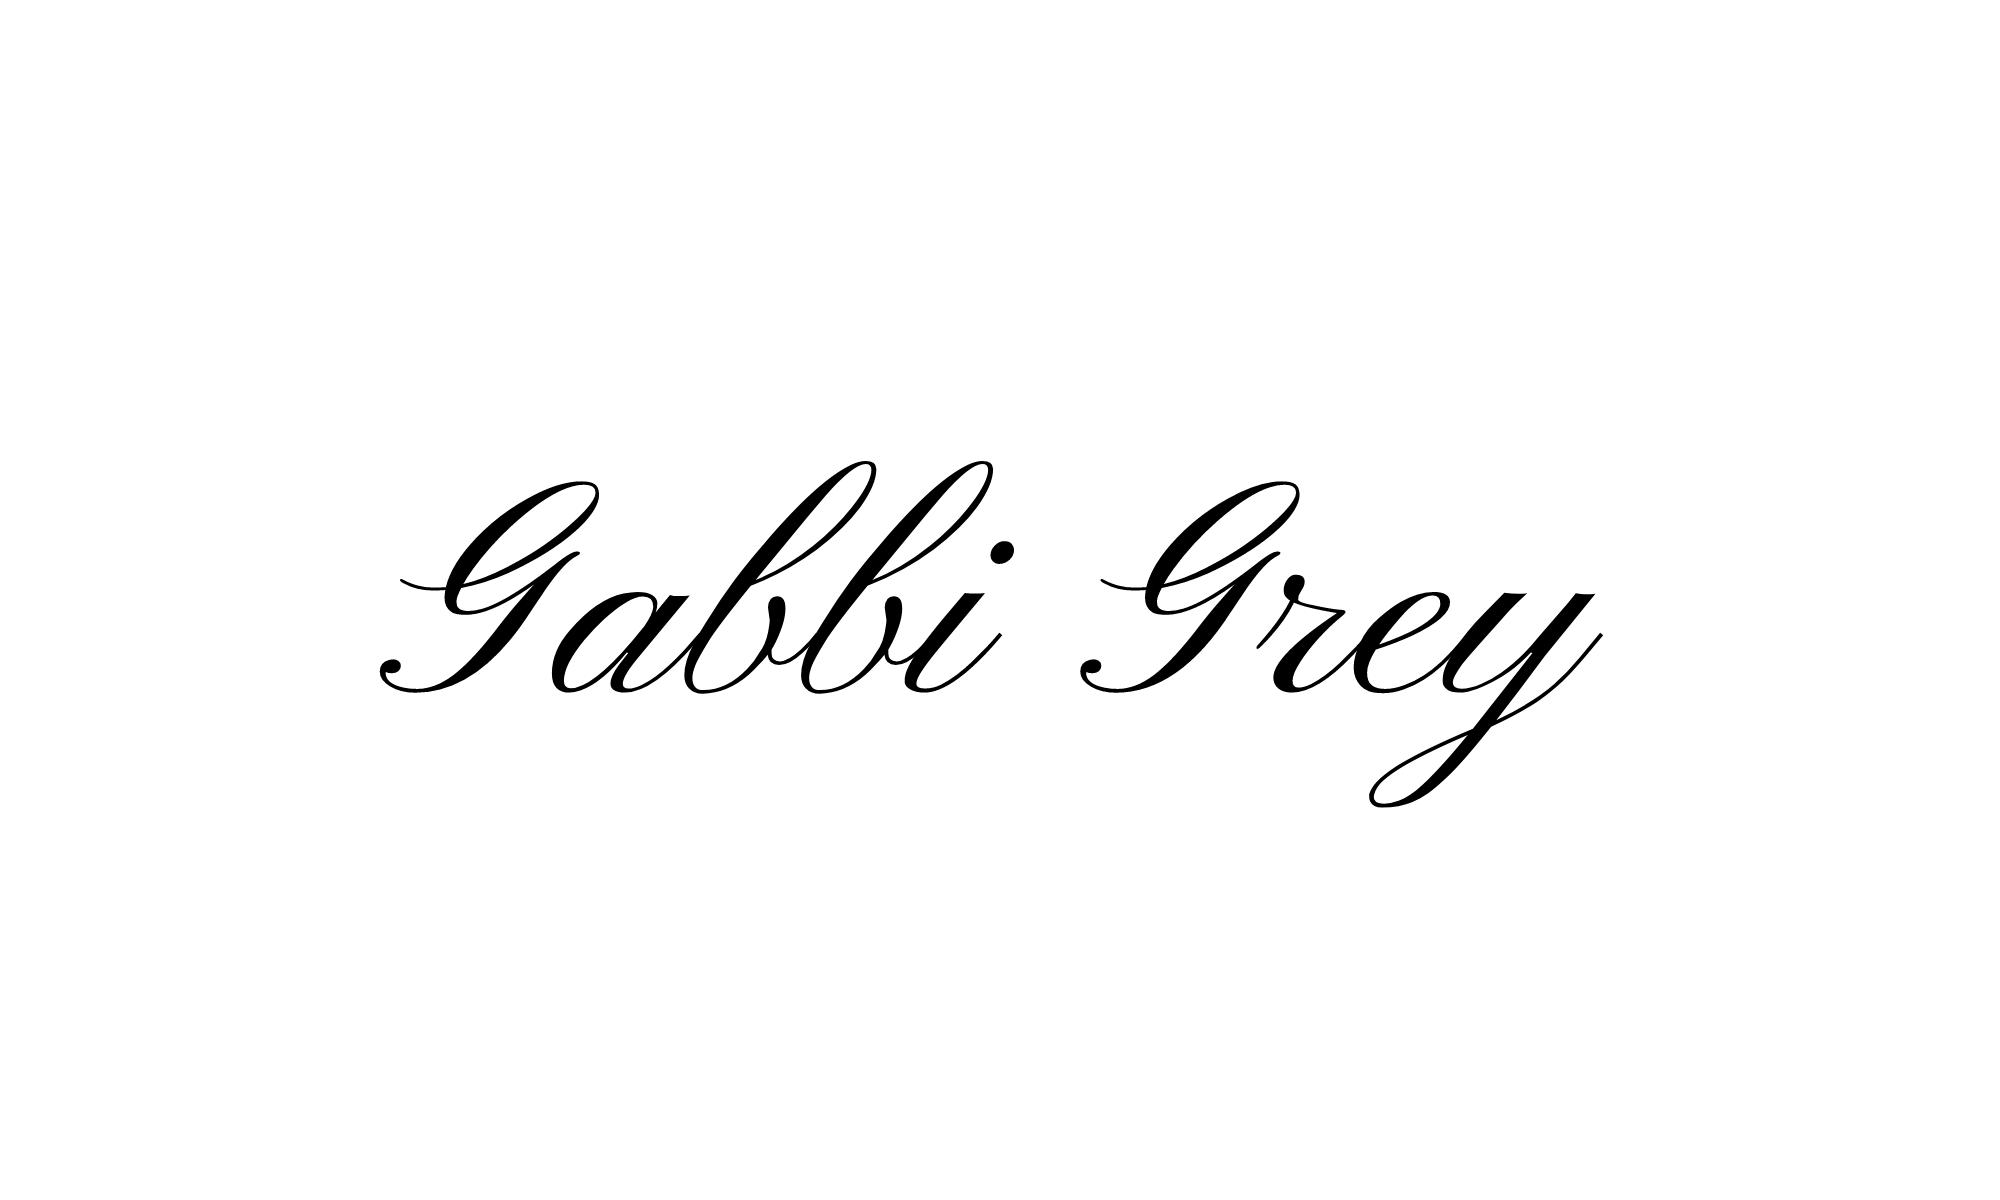 Gabbi Grey